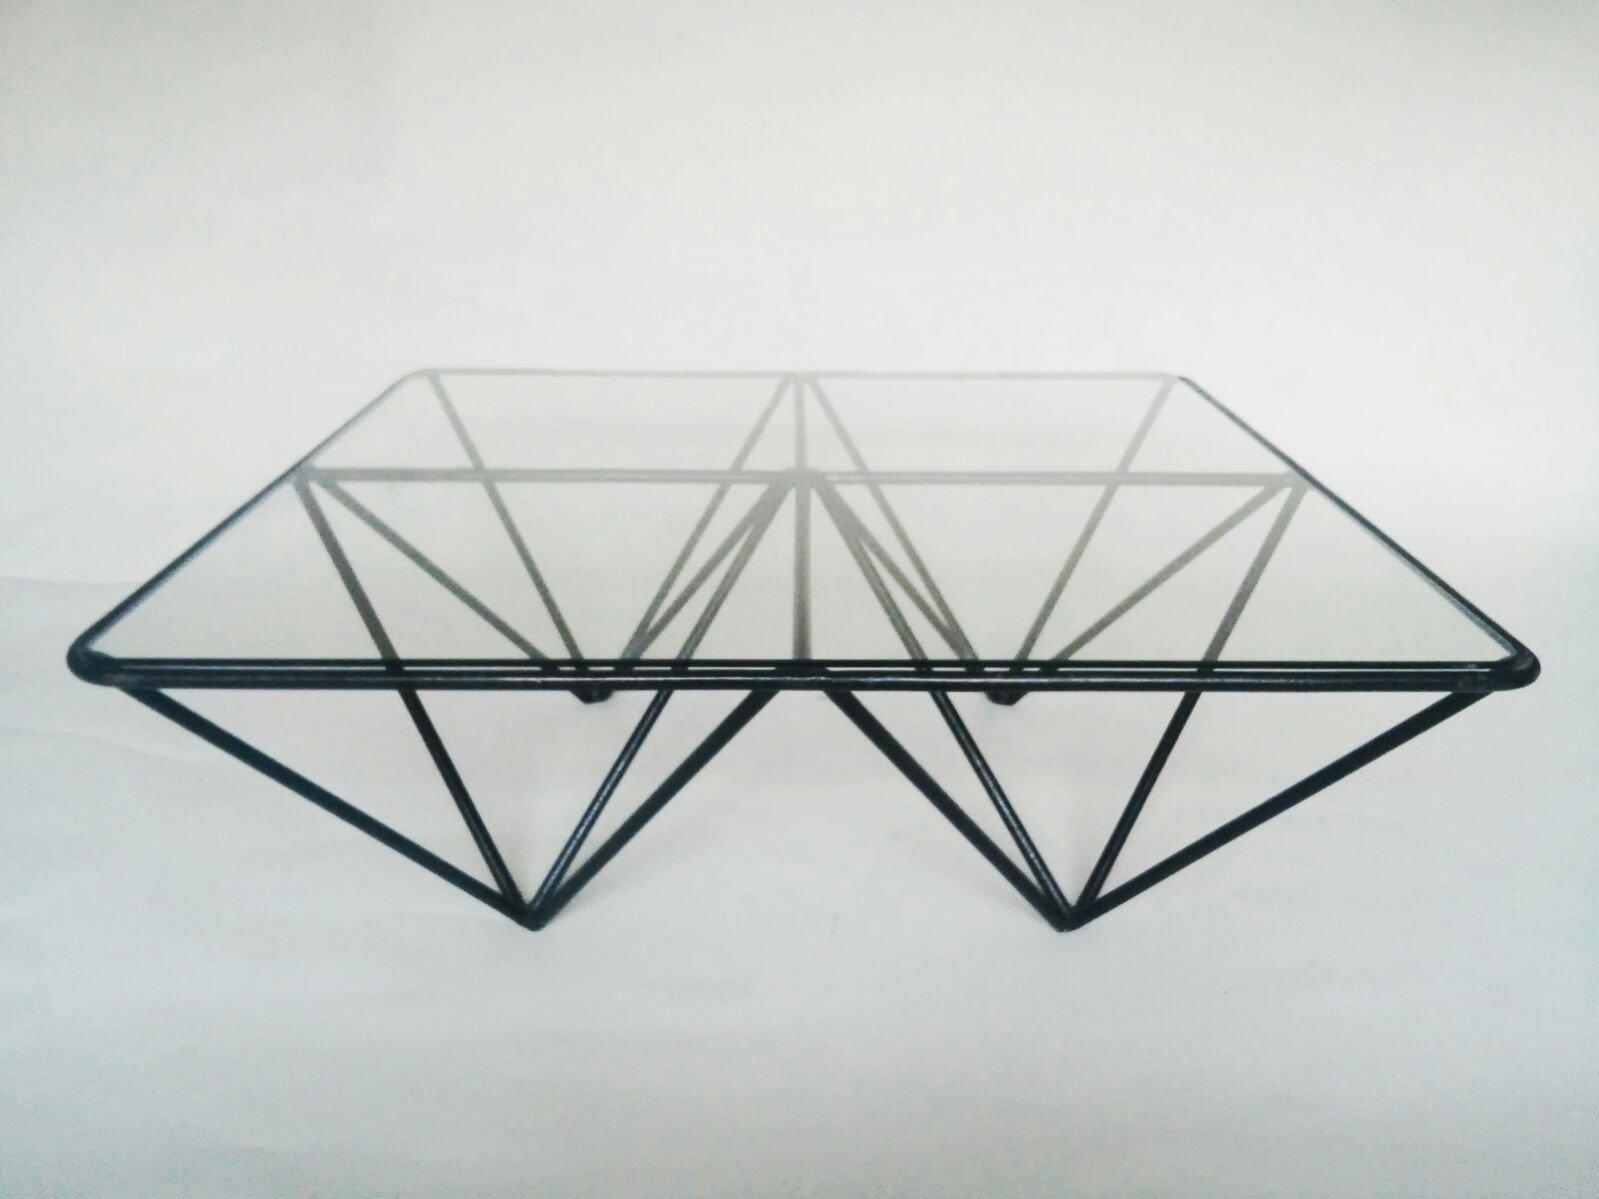 Grande table basse vintage en fer et verre italie 1980s en vente sur pamono - Grande table en verre ...